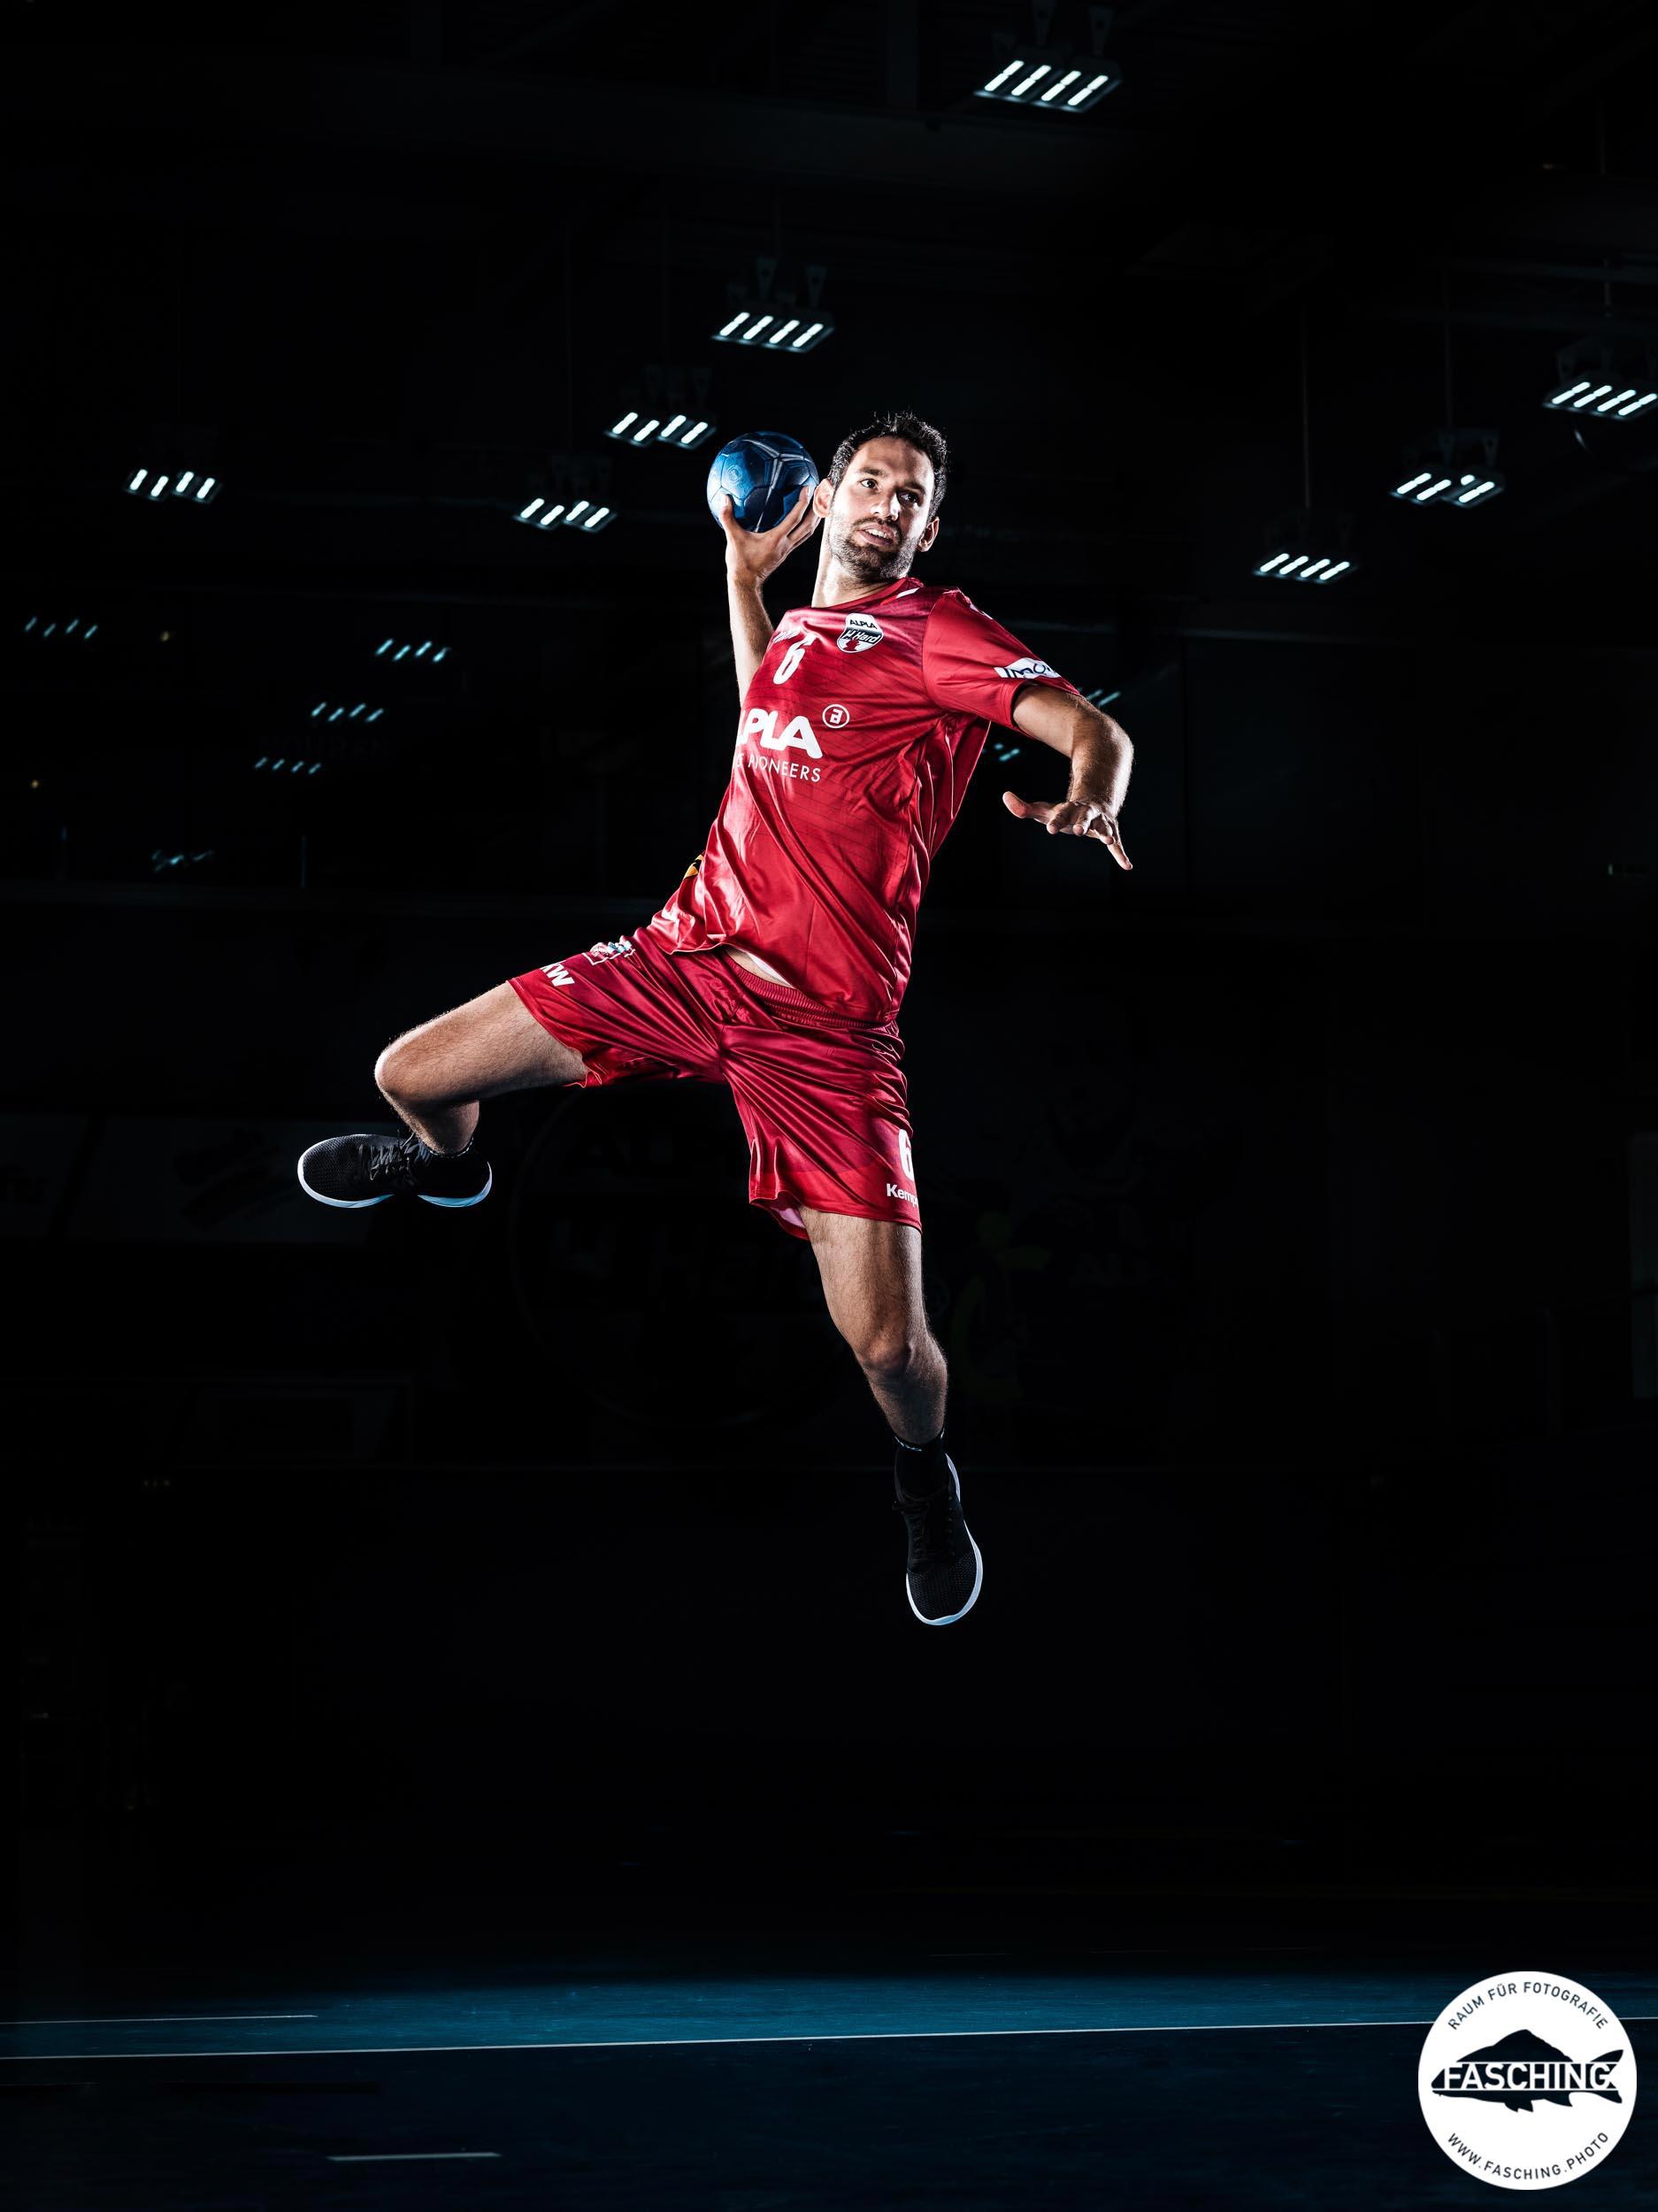 Sprungwurrf Actionfoto Dominik Schmid, Handball HC Hard, Fotografie Luca Fasching, Fotostudio in Vorarlberg